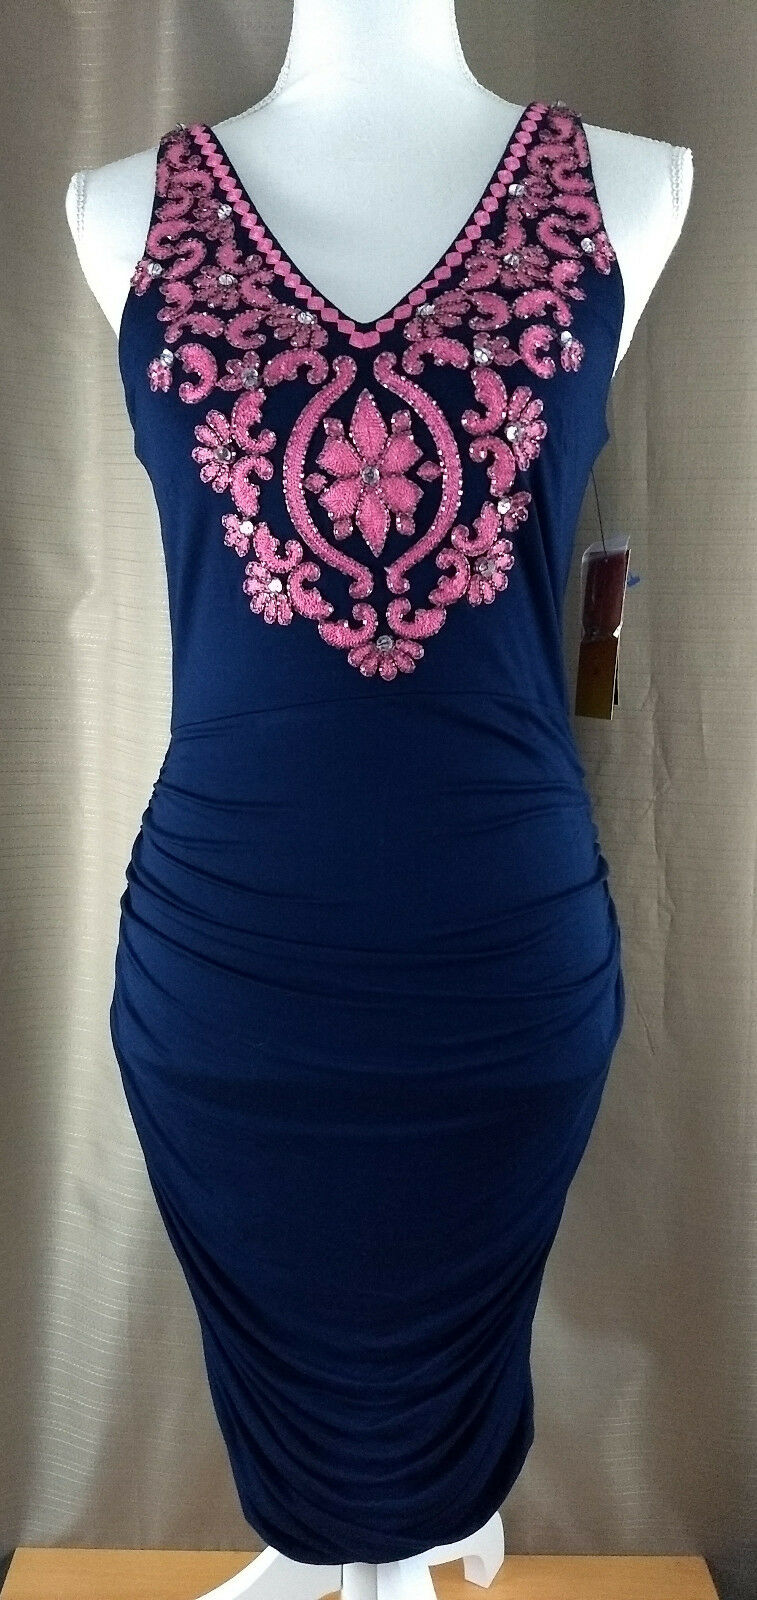 Inc bluee Pink Daisy Embroidered Beaded Women's Medium Sheath Dress Dress Dress Sleeveless 8753ee